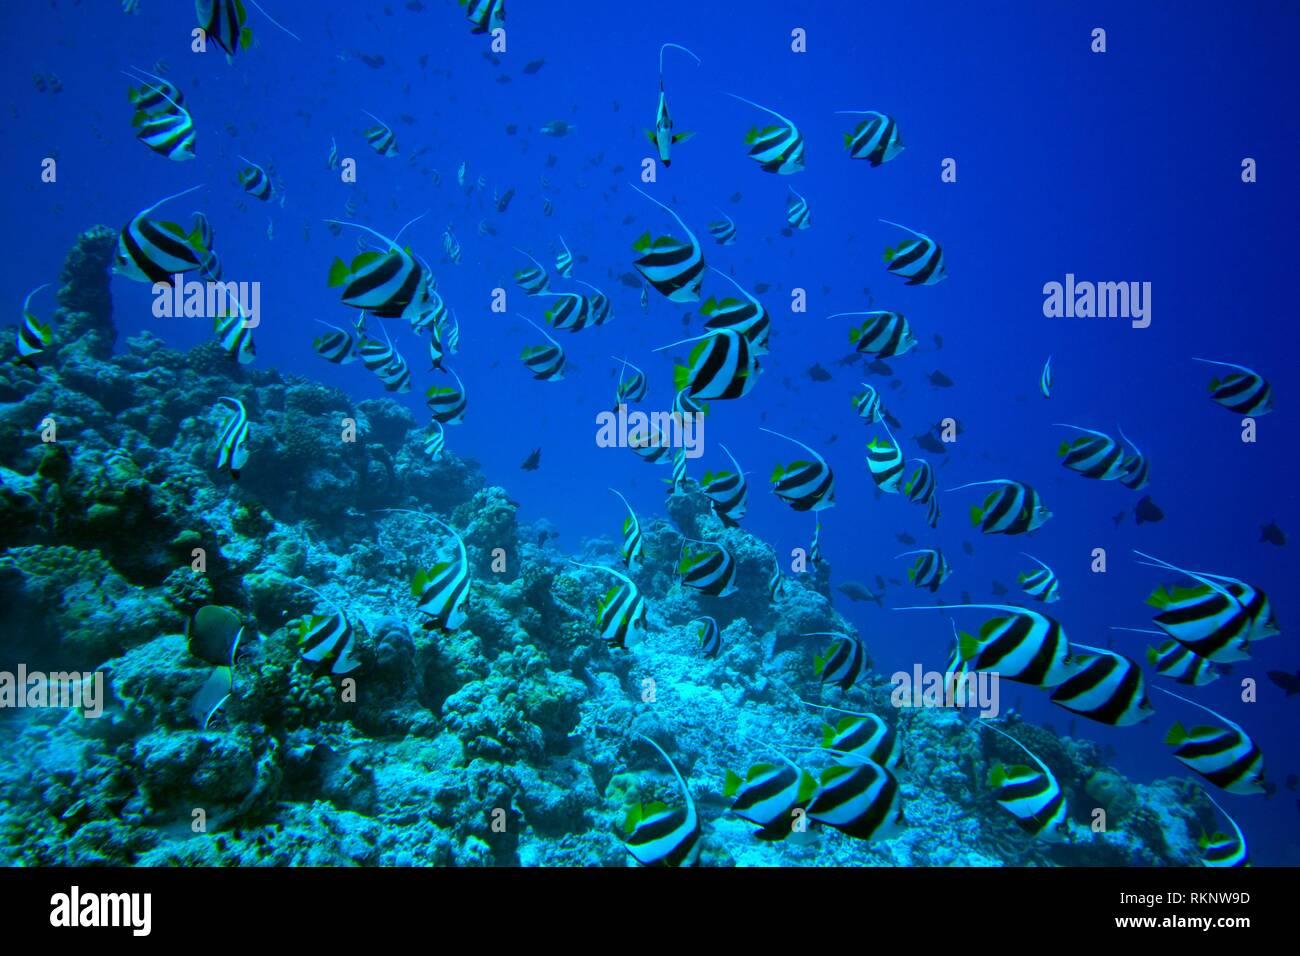 Schooling Banner fish (Heniochus diphreutes), Indian Ocean, Maledives, South Asia. - Stock Image